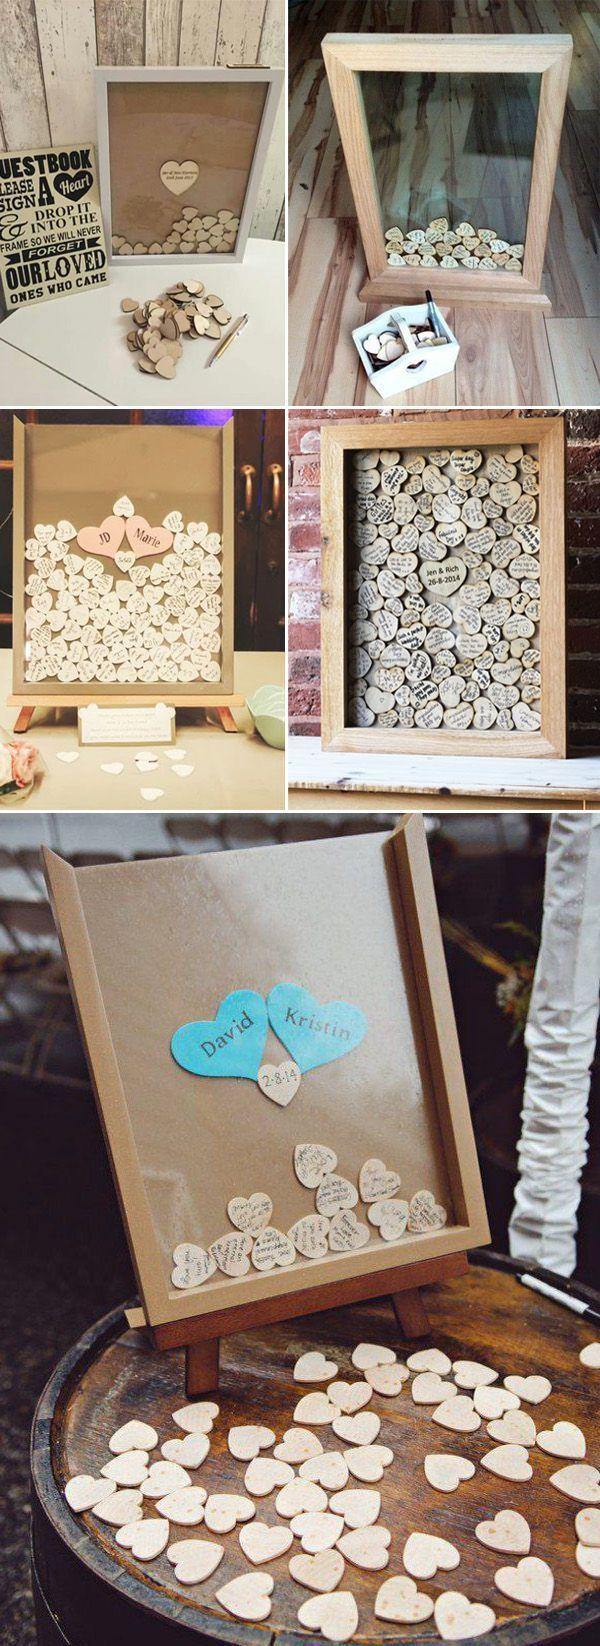 DIY heart shaped wedding guest books ideas